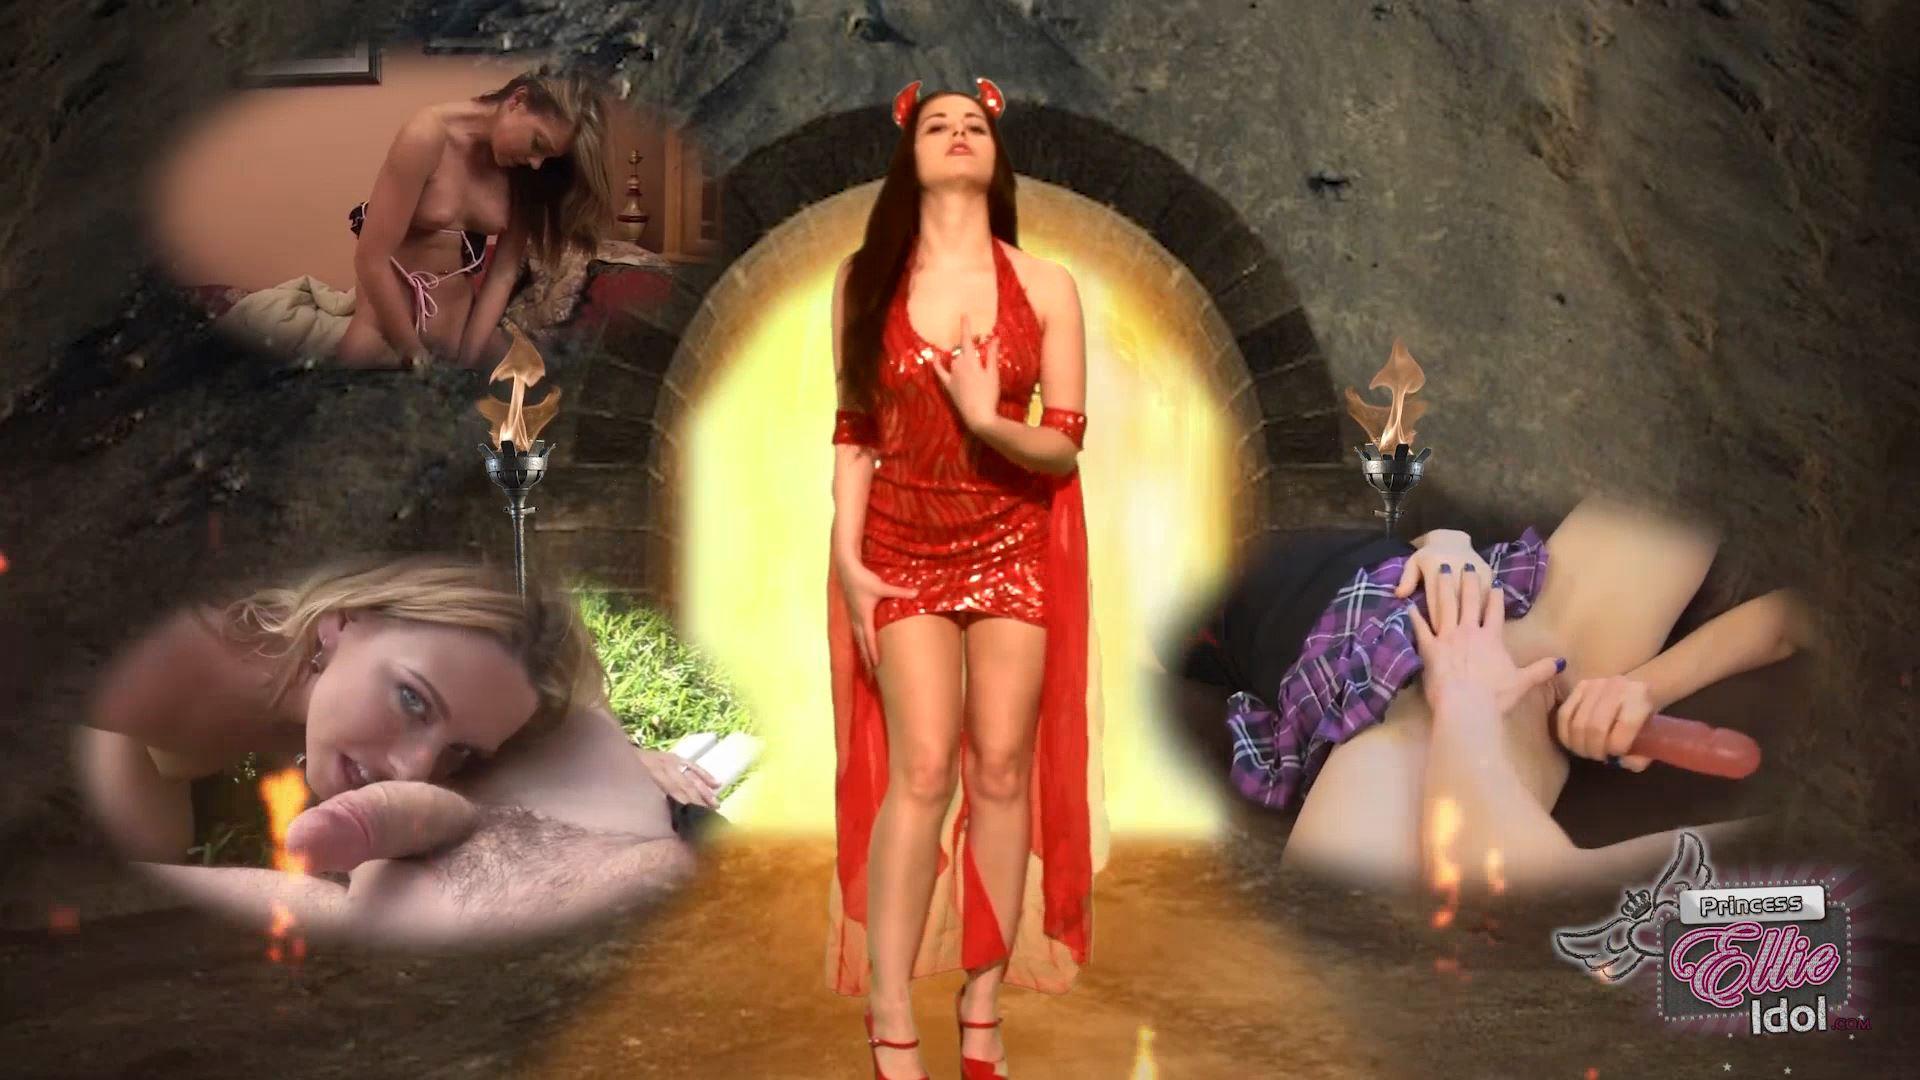 Ellie Idol Wel In Scene: Cum To Hell - PRINCESSELLIEIDOL - FULL HD/1080p/MP4